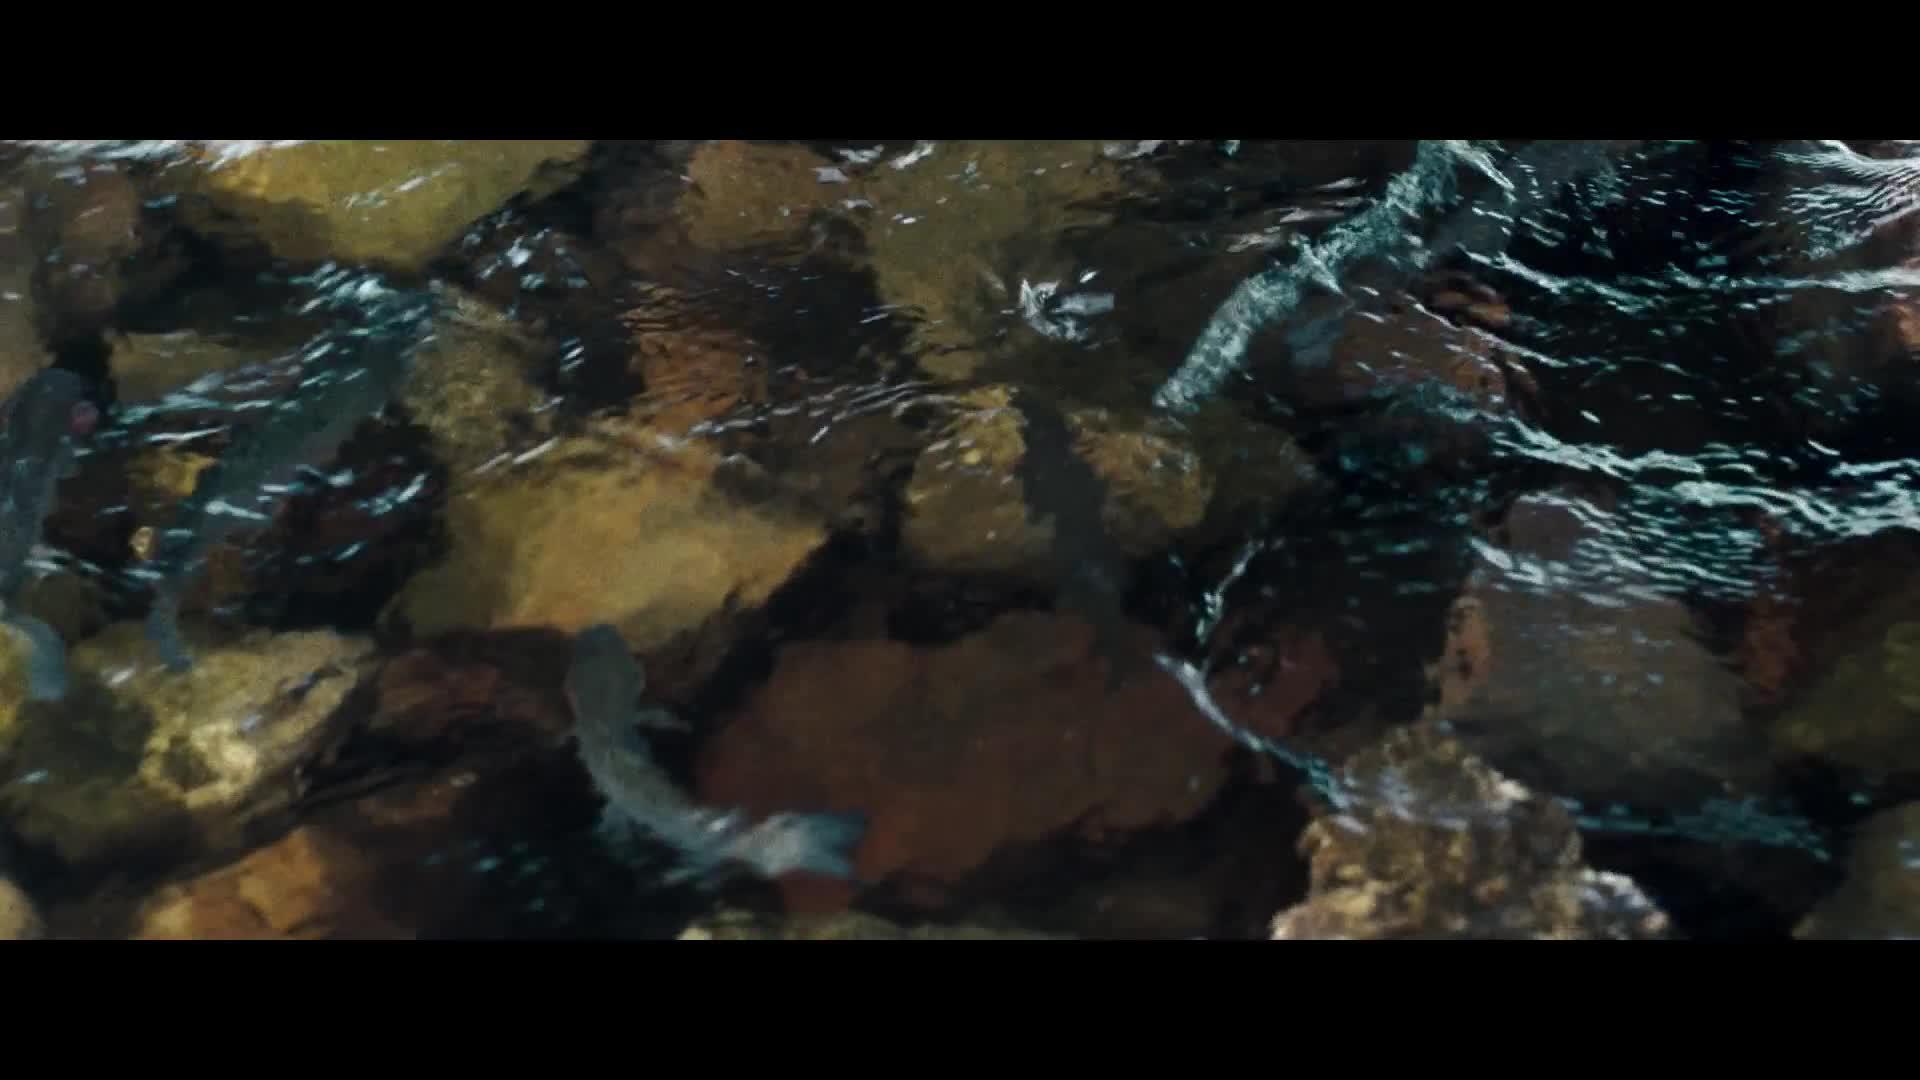 The Mummy 3 Tomb Of The Dragon Emperor คืนชีพจักรพรรดิมังกร (2008)